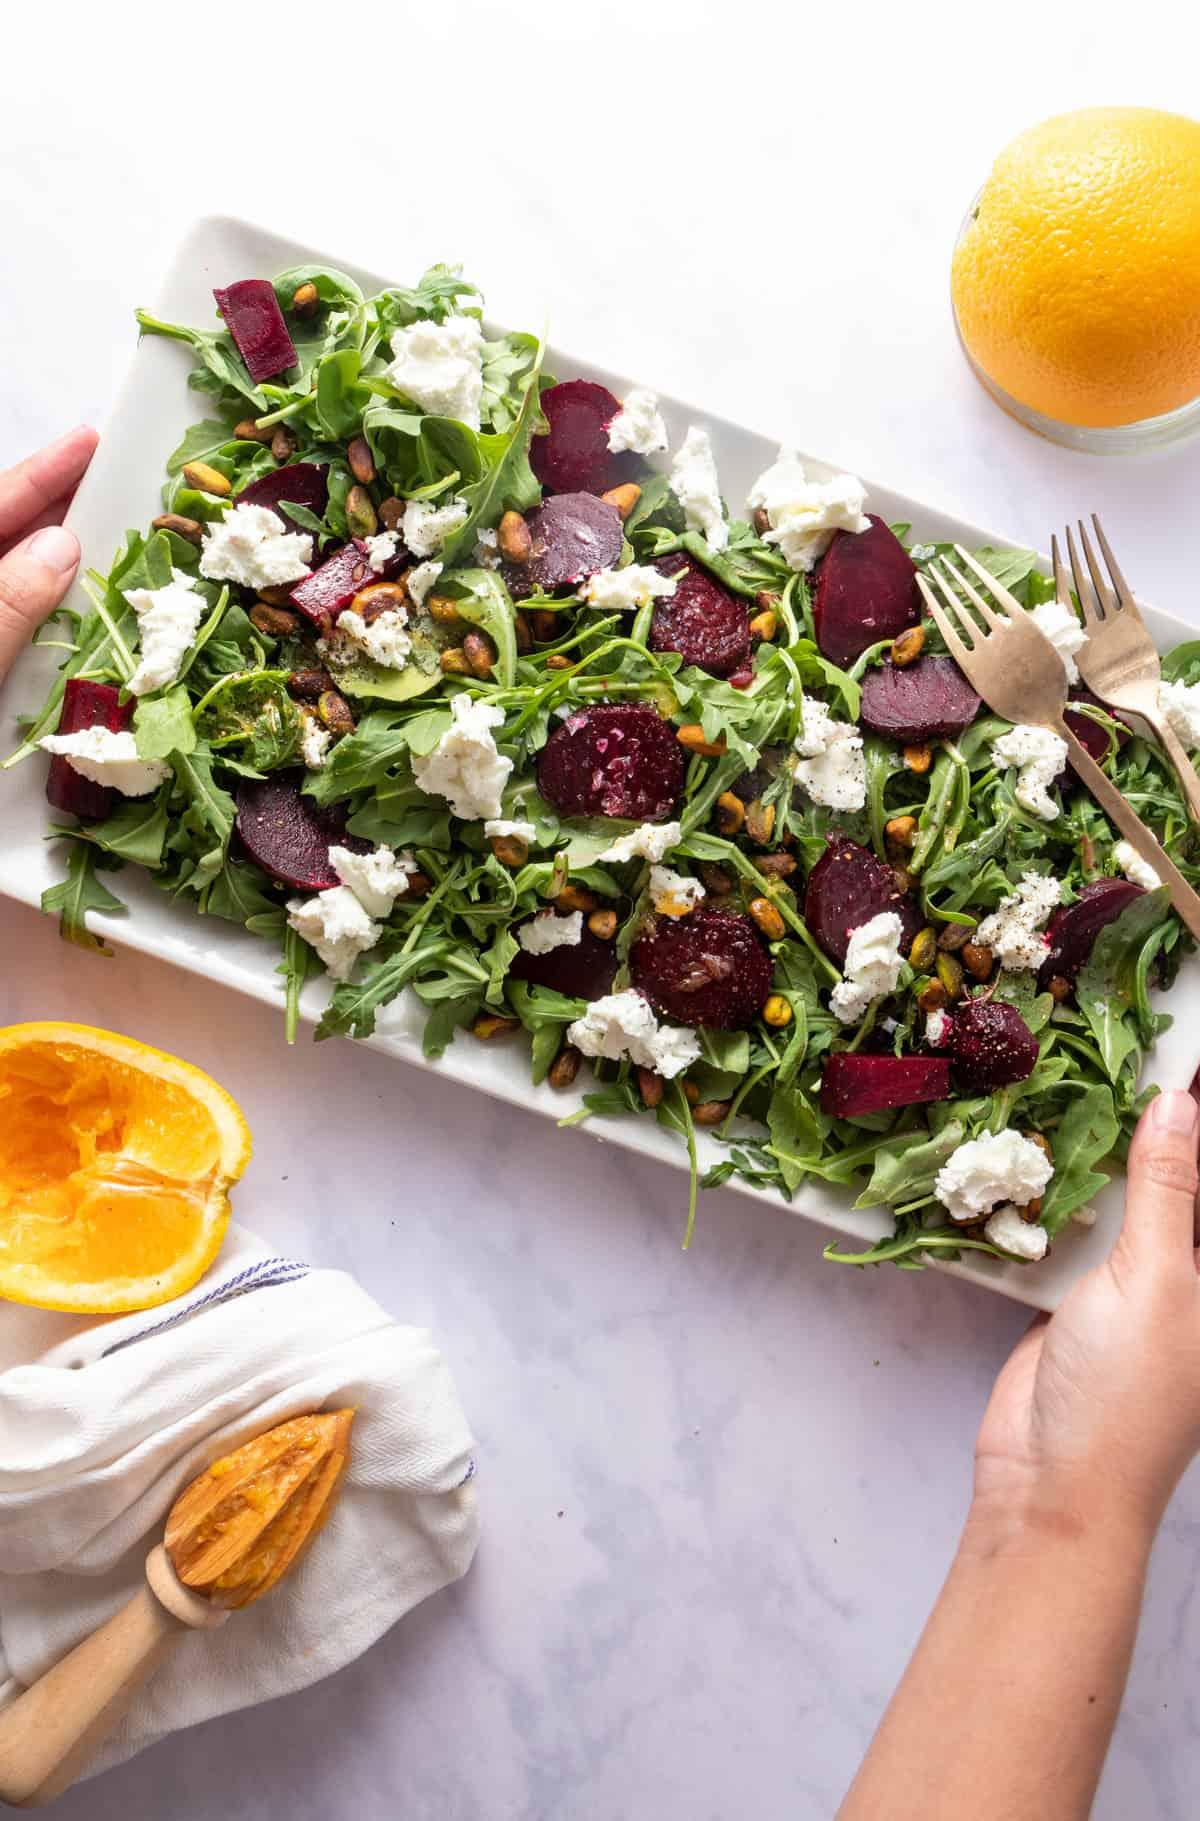 Serving a platter of the finished salad